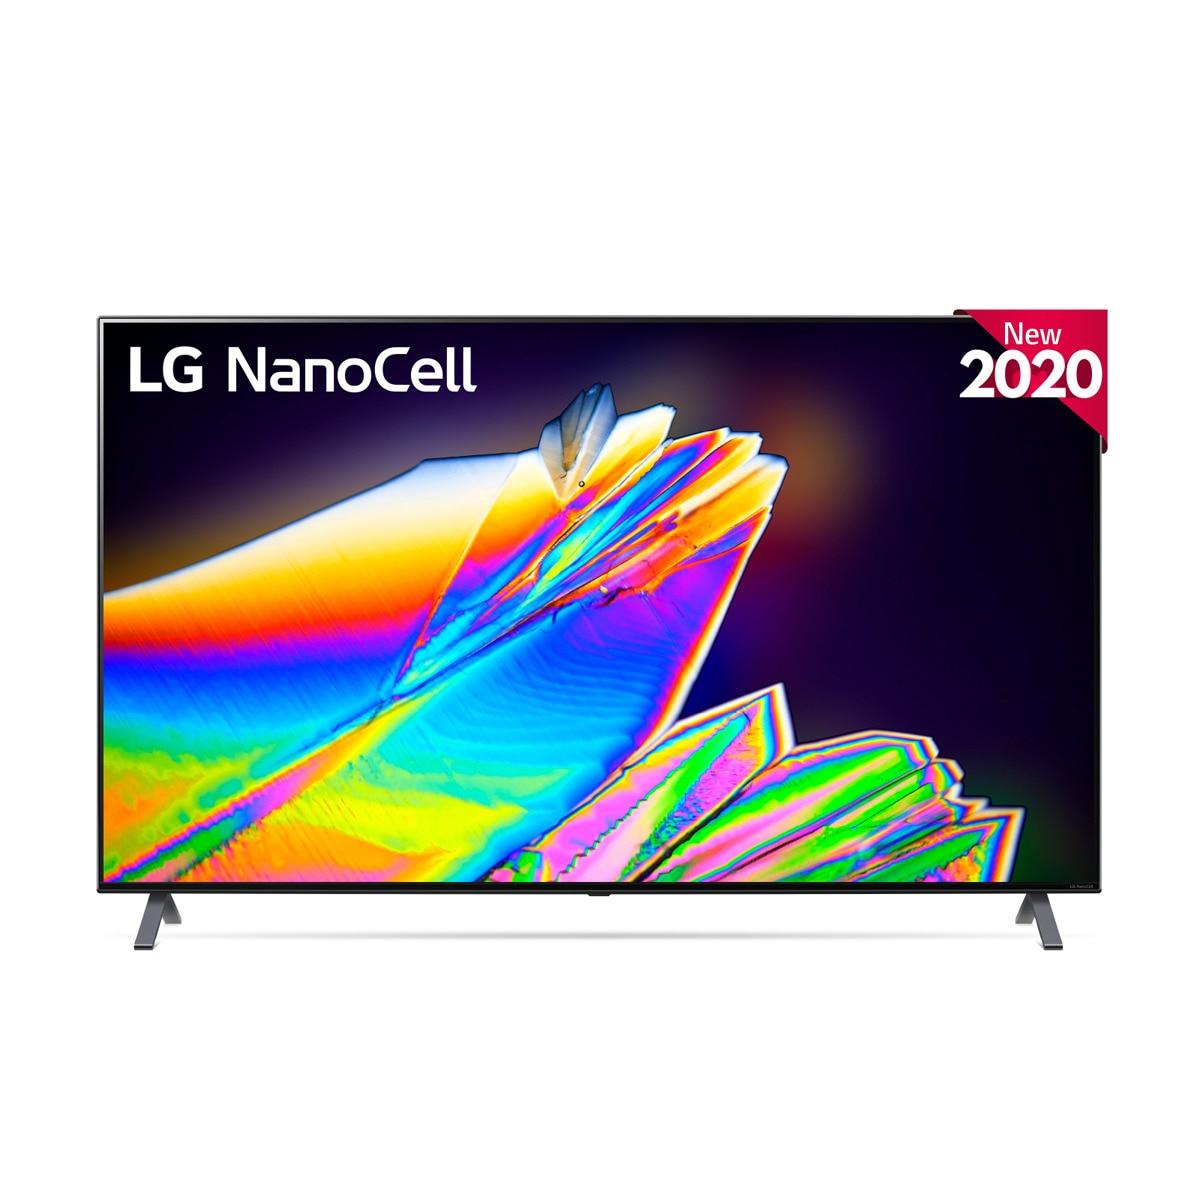 "TV LED 138,8 cm (55"") LG 55NANO956NA NanoCell 8K con Inteligencia Artificial, HDR Dolby Vision IQ y Smart TV"